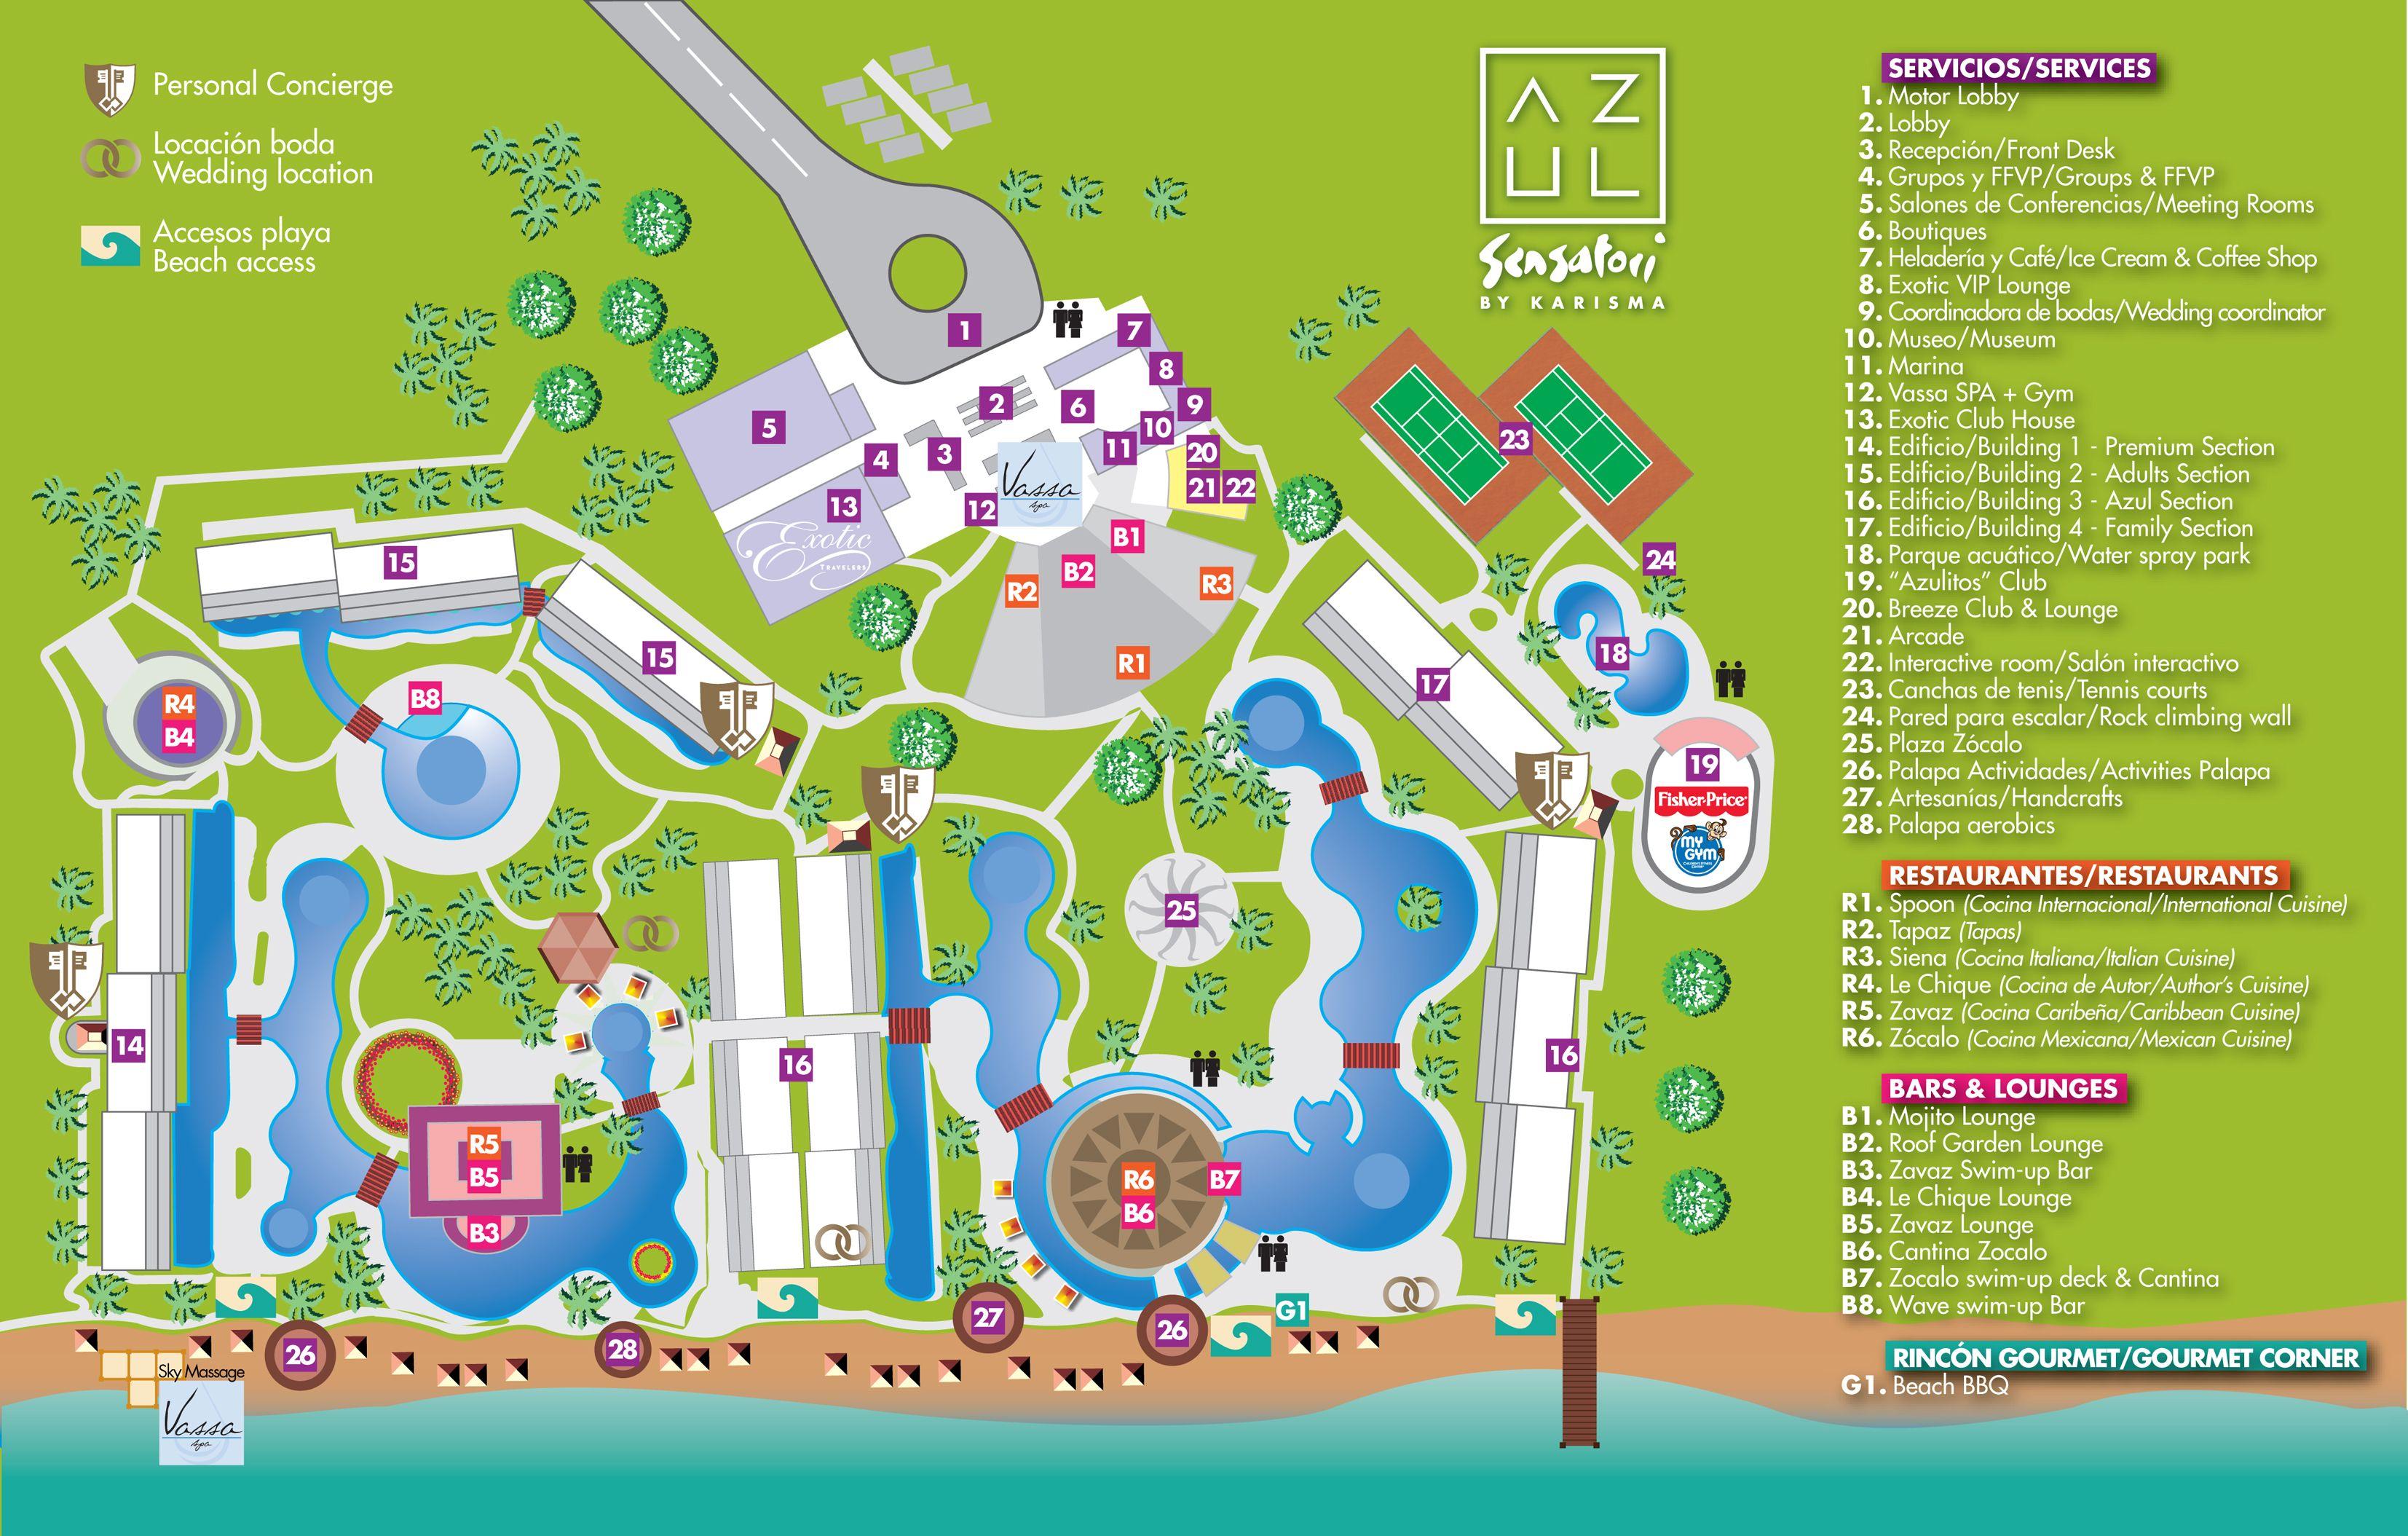 Azul Sensatori Resort Map Vacations Azul Sensatori